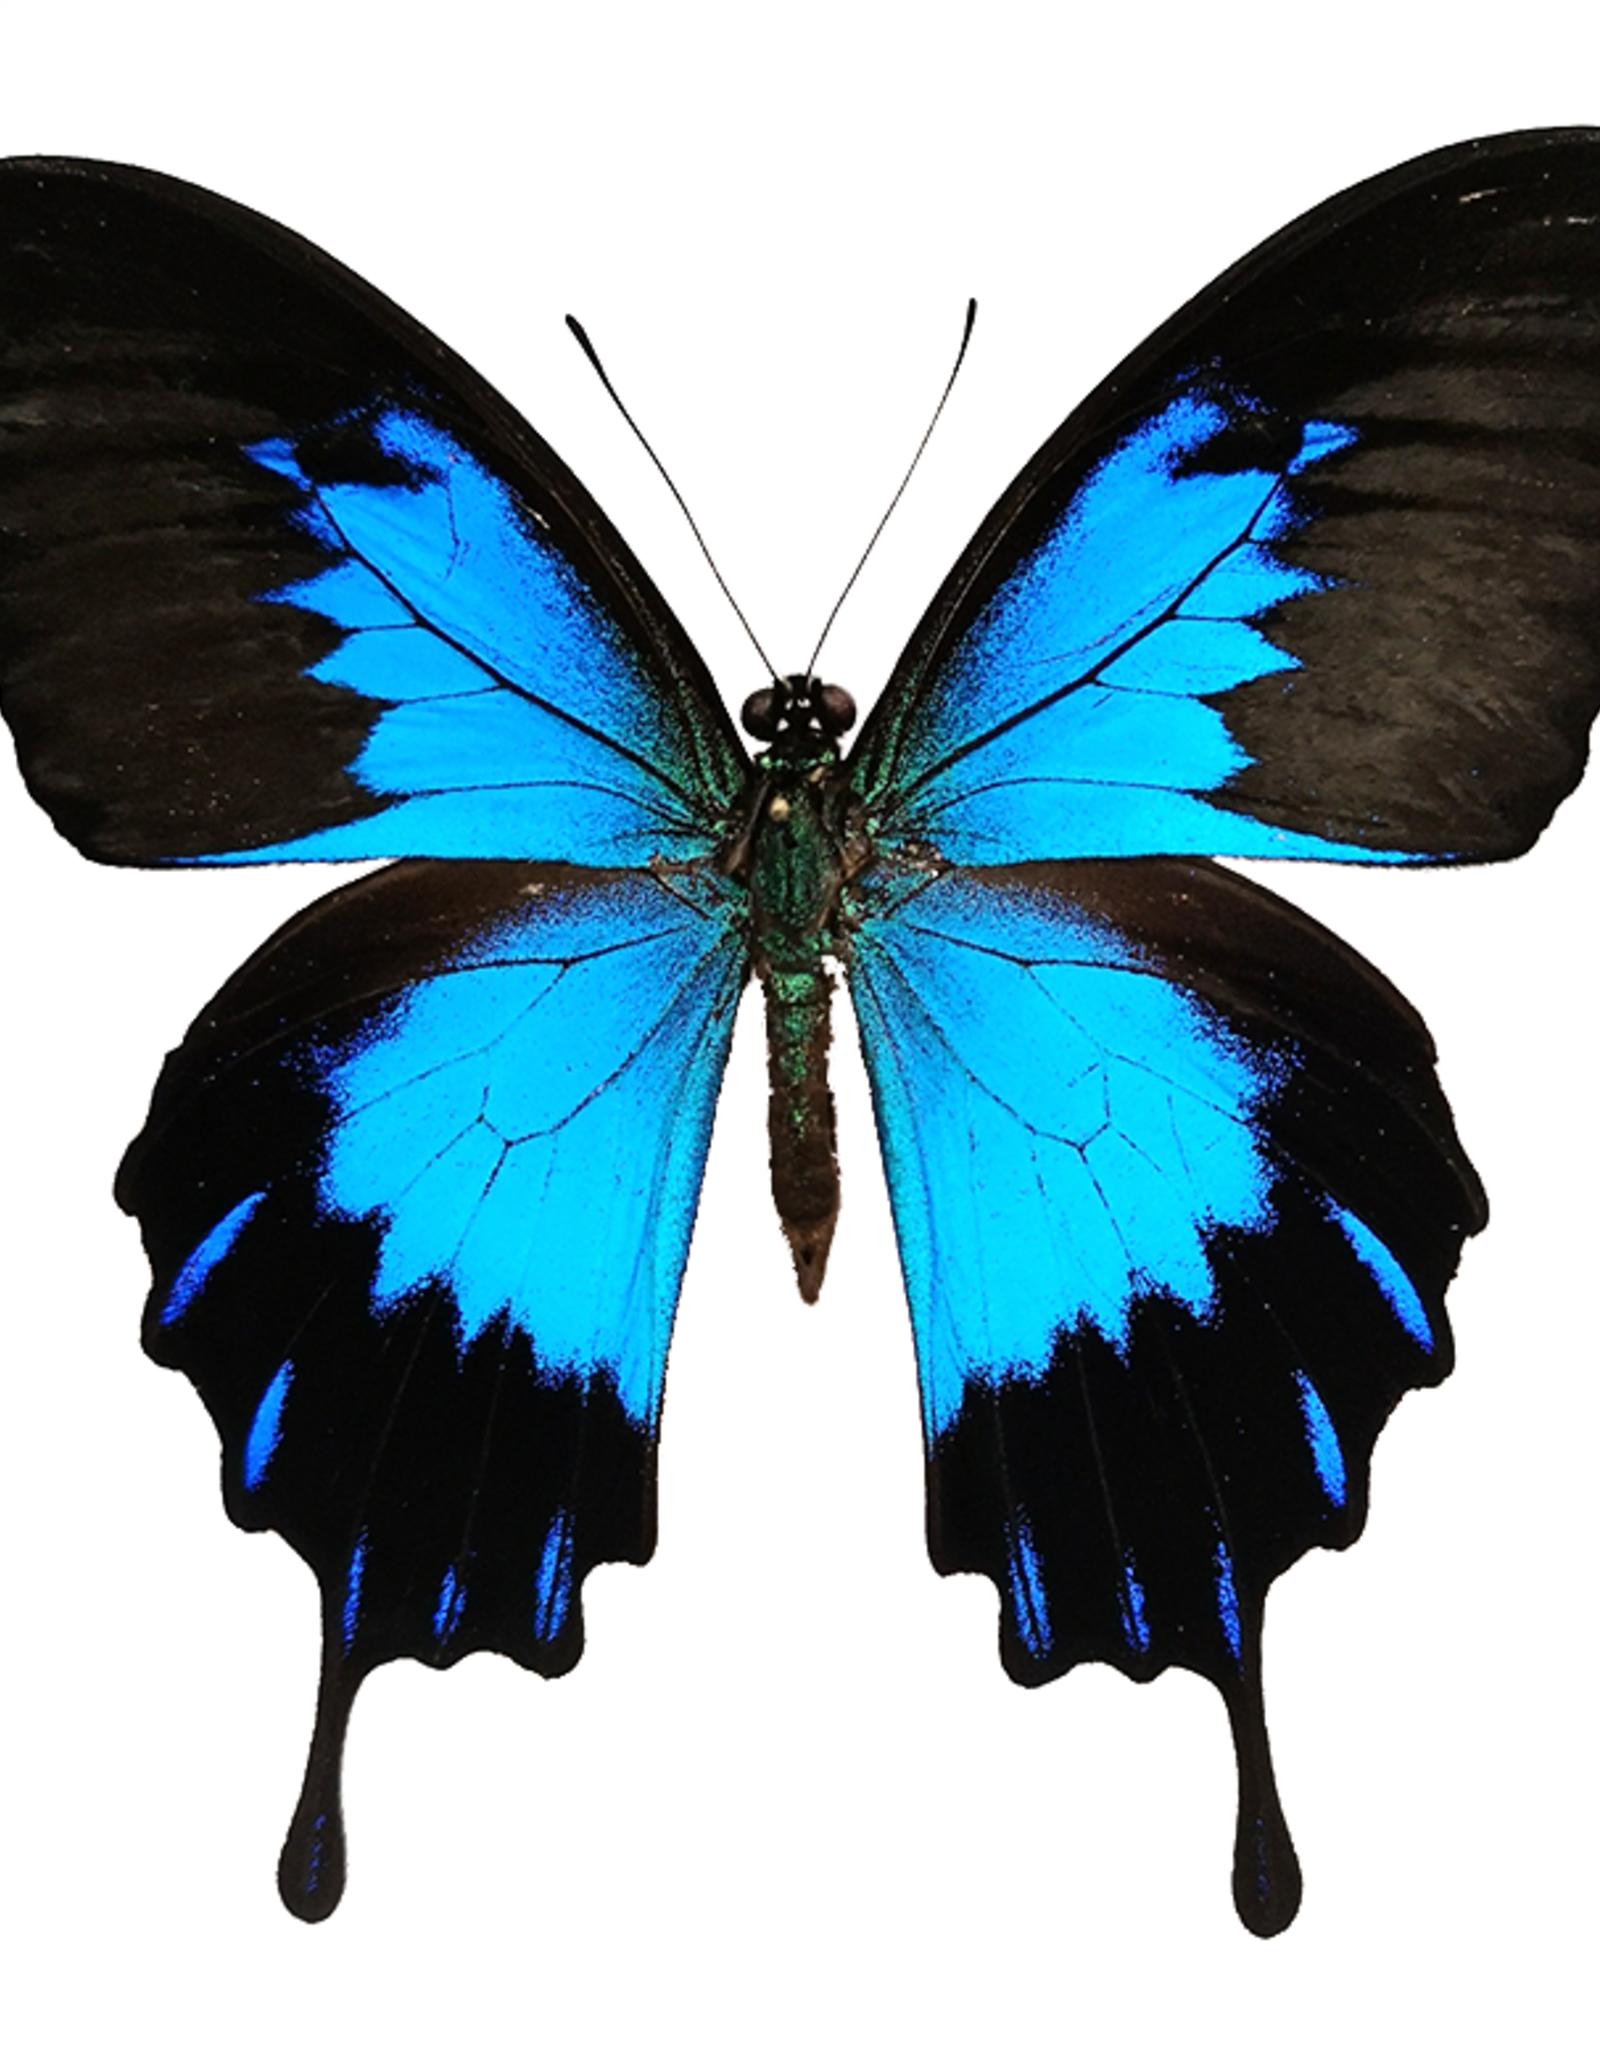 Papilio ulysses telegonus M A1 Indonesia Bachan Isl.